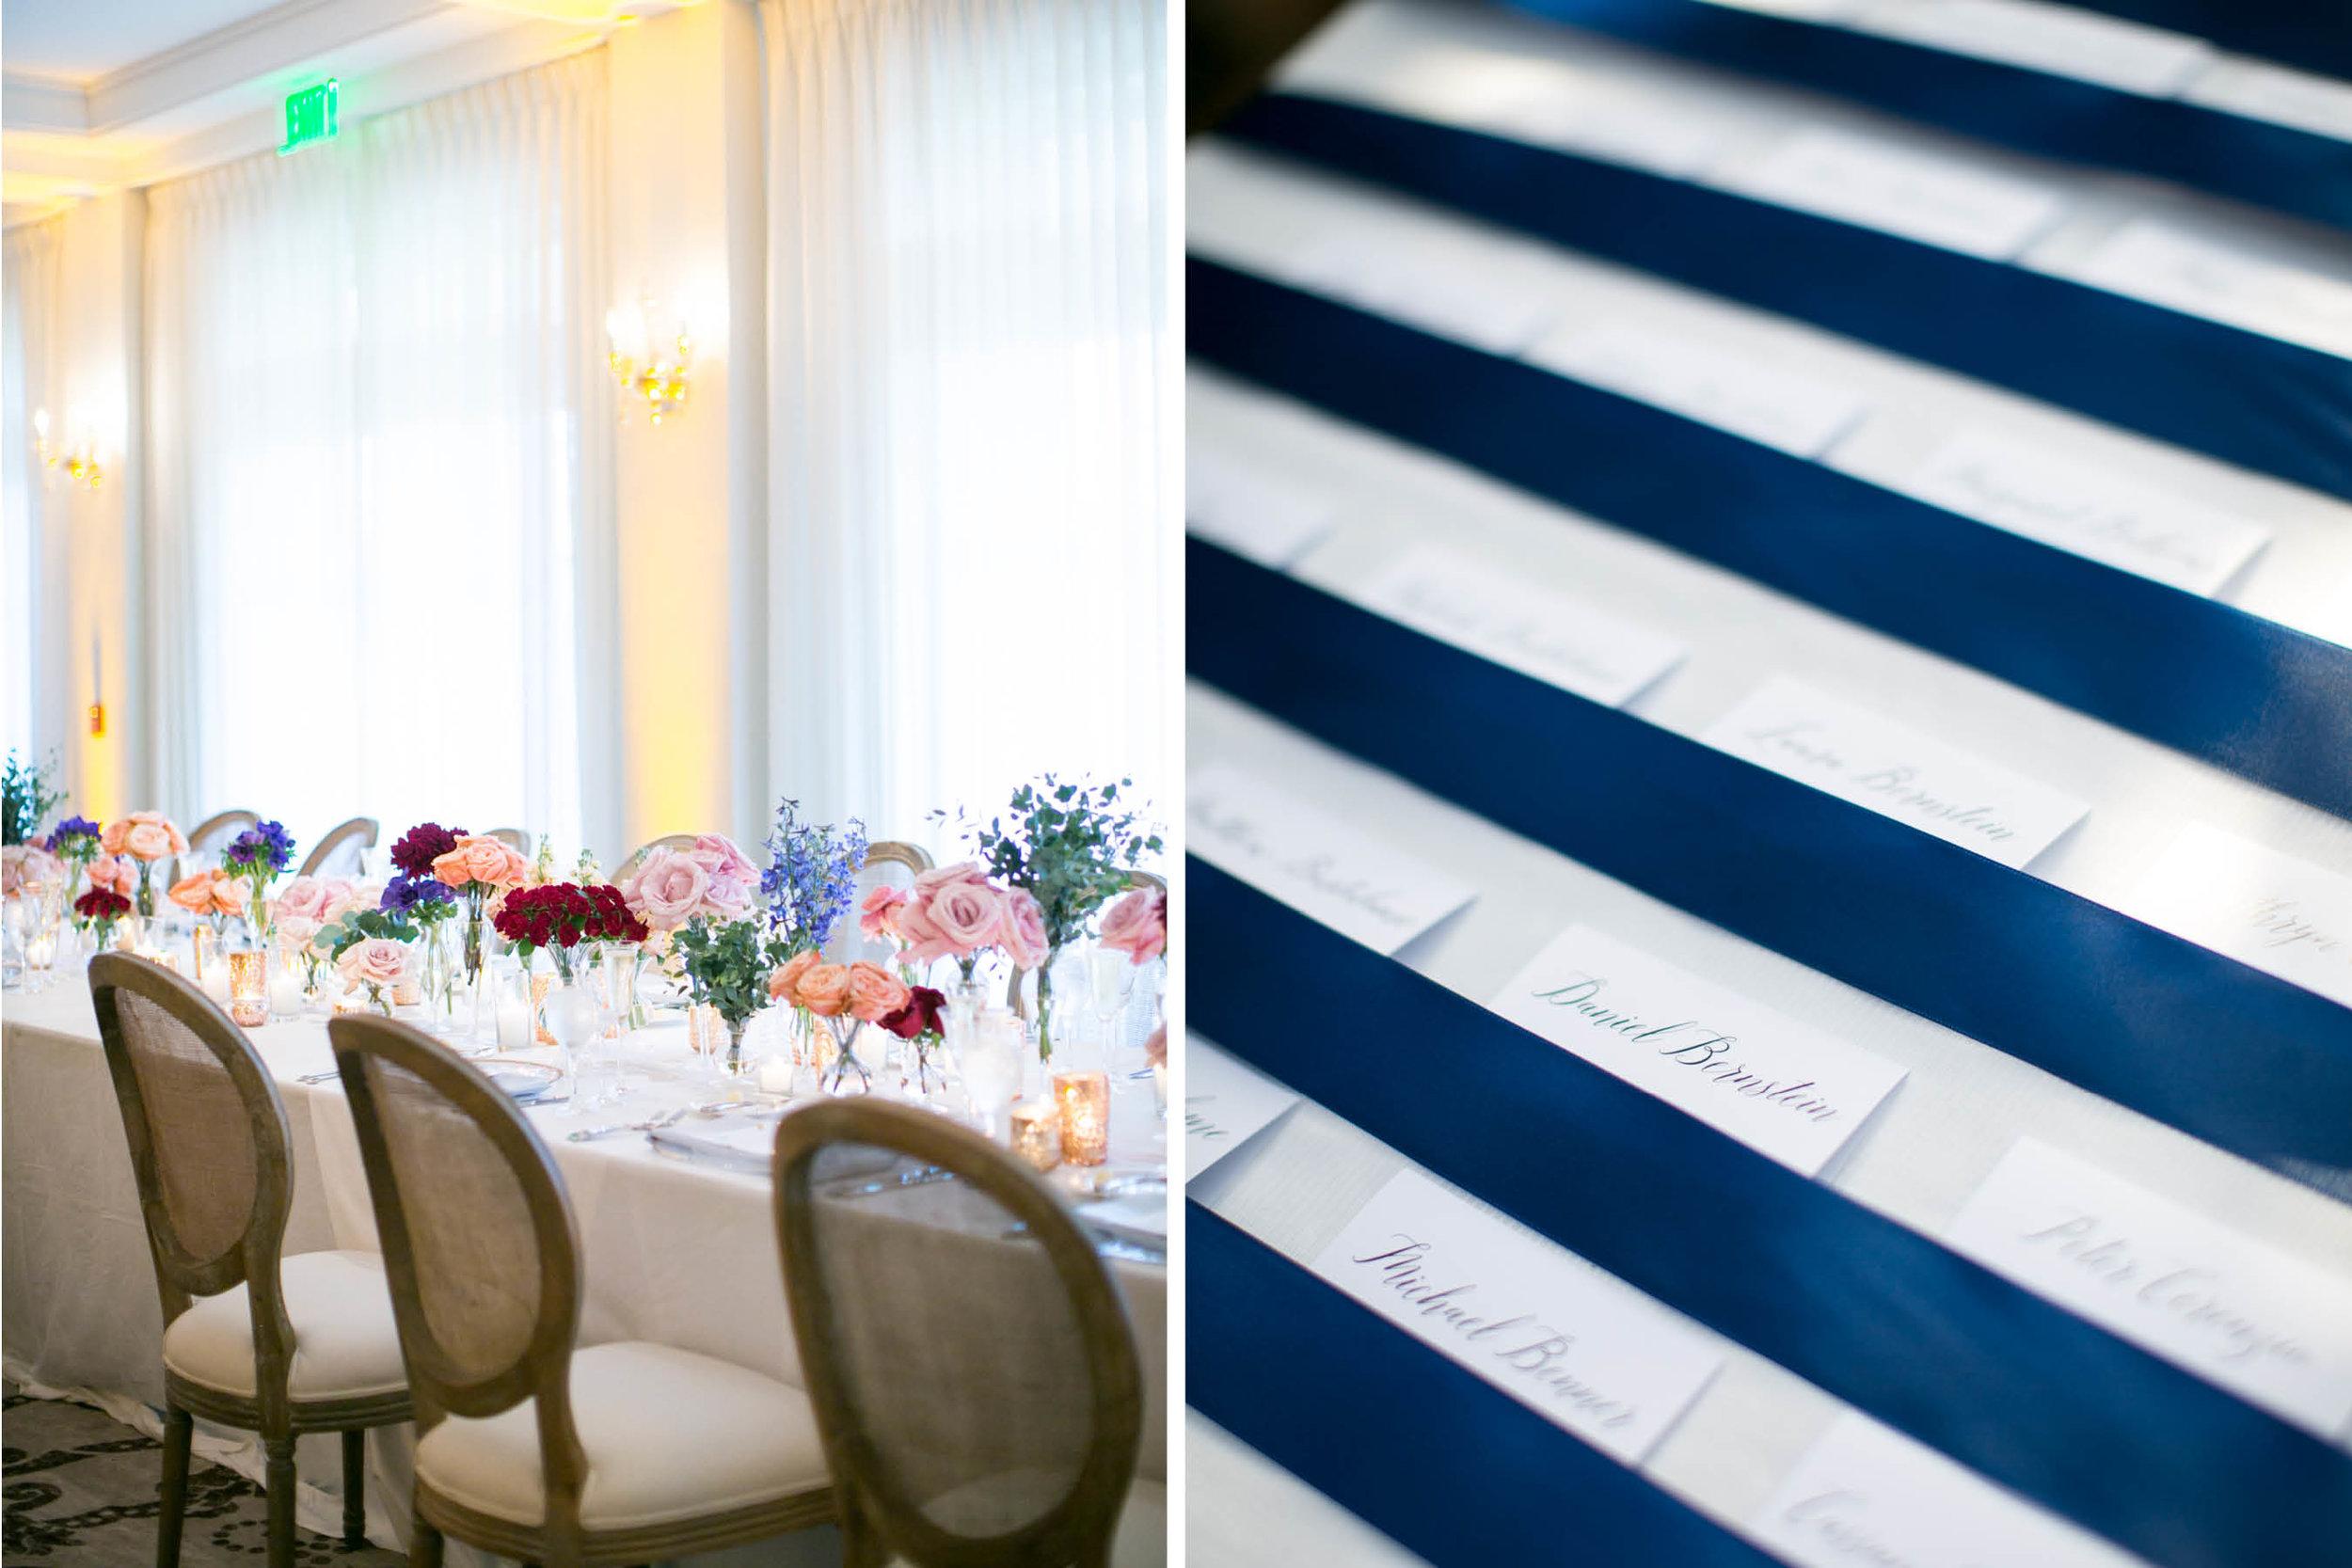 alegria-by-design-wedding-planner-planning-coordination-day-of-event-design-el-encanto-resort-riviera-garden-lily-pond-outdoor-red-navy (10).jpg